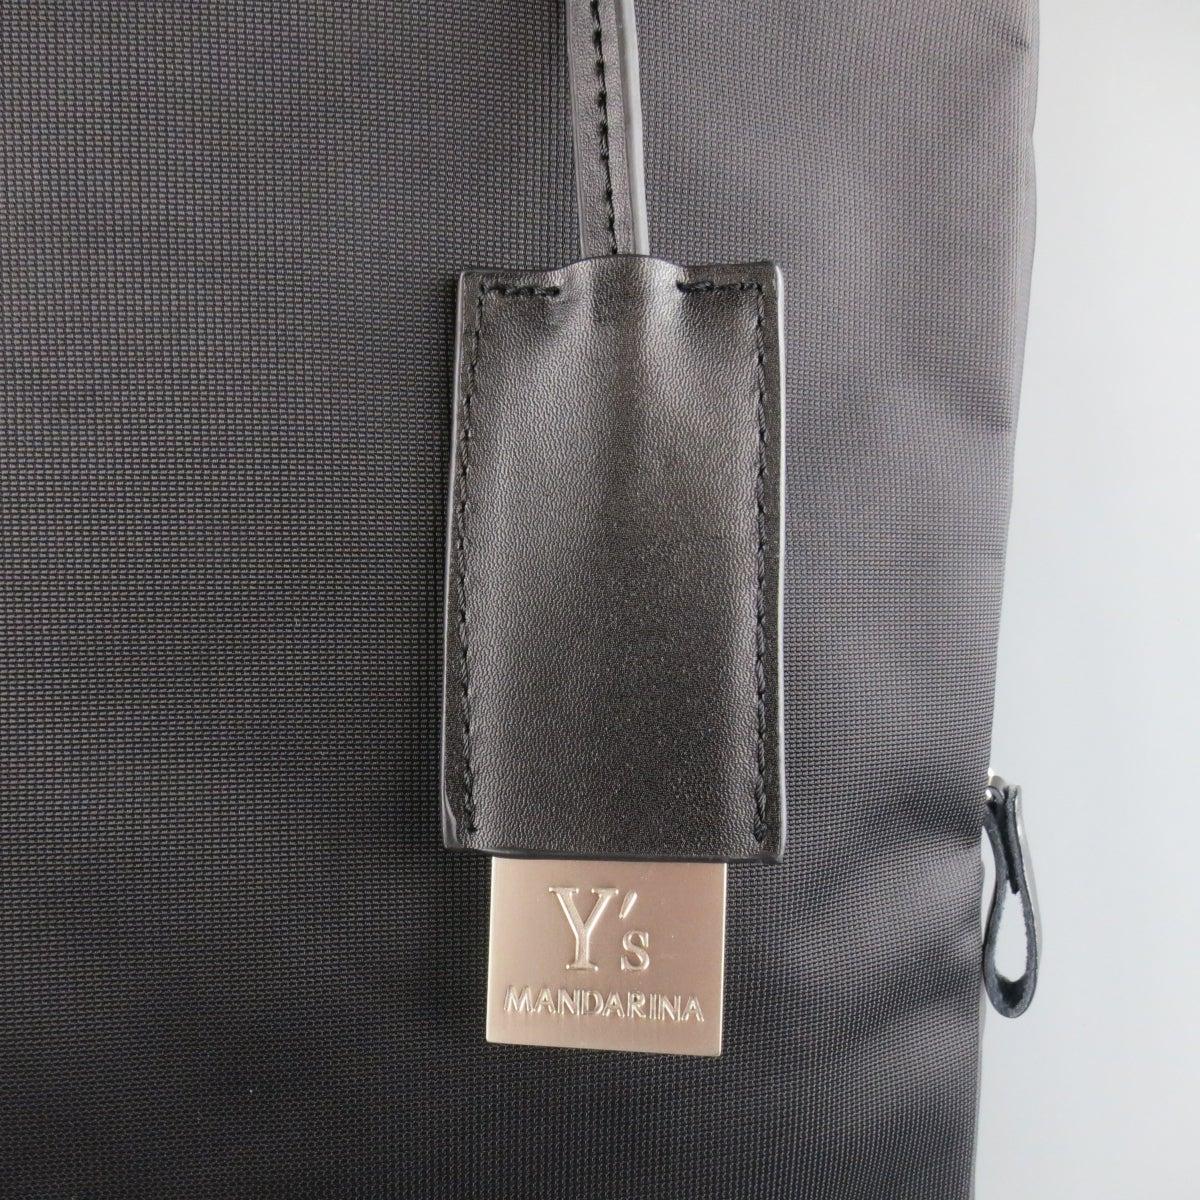 80371431ffe9 Y s by YOHJI YAMAMOTO MANDARINA Black Nylon Crossbody Tote Bag at 1stdibs